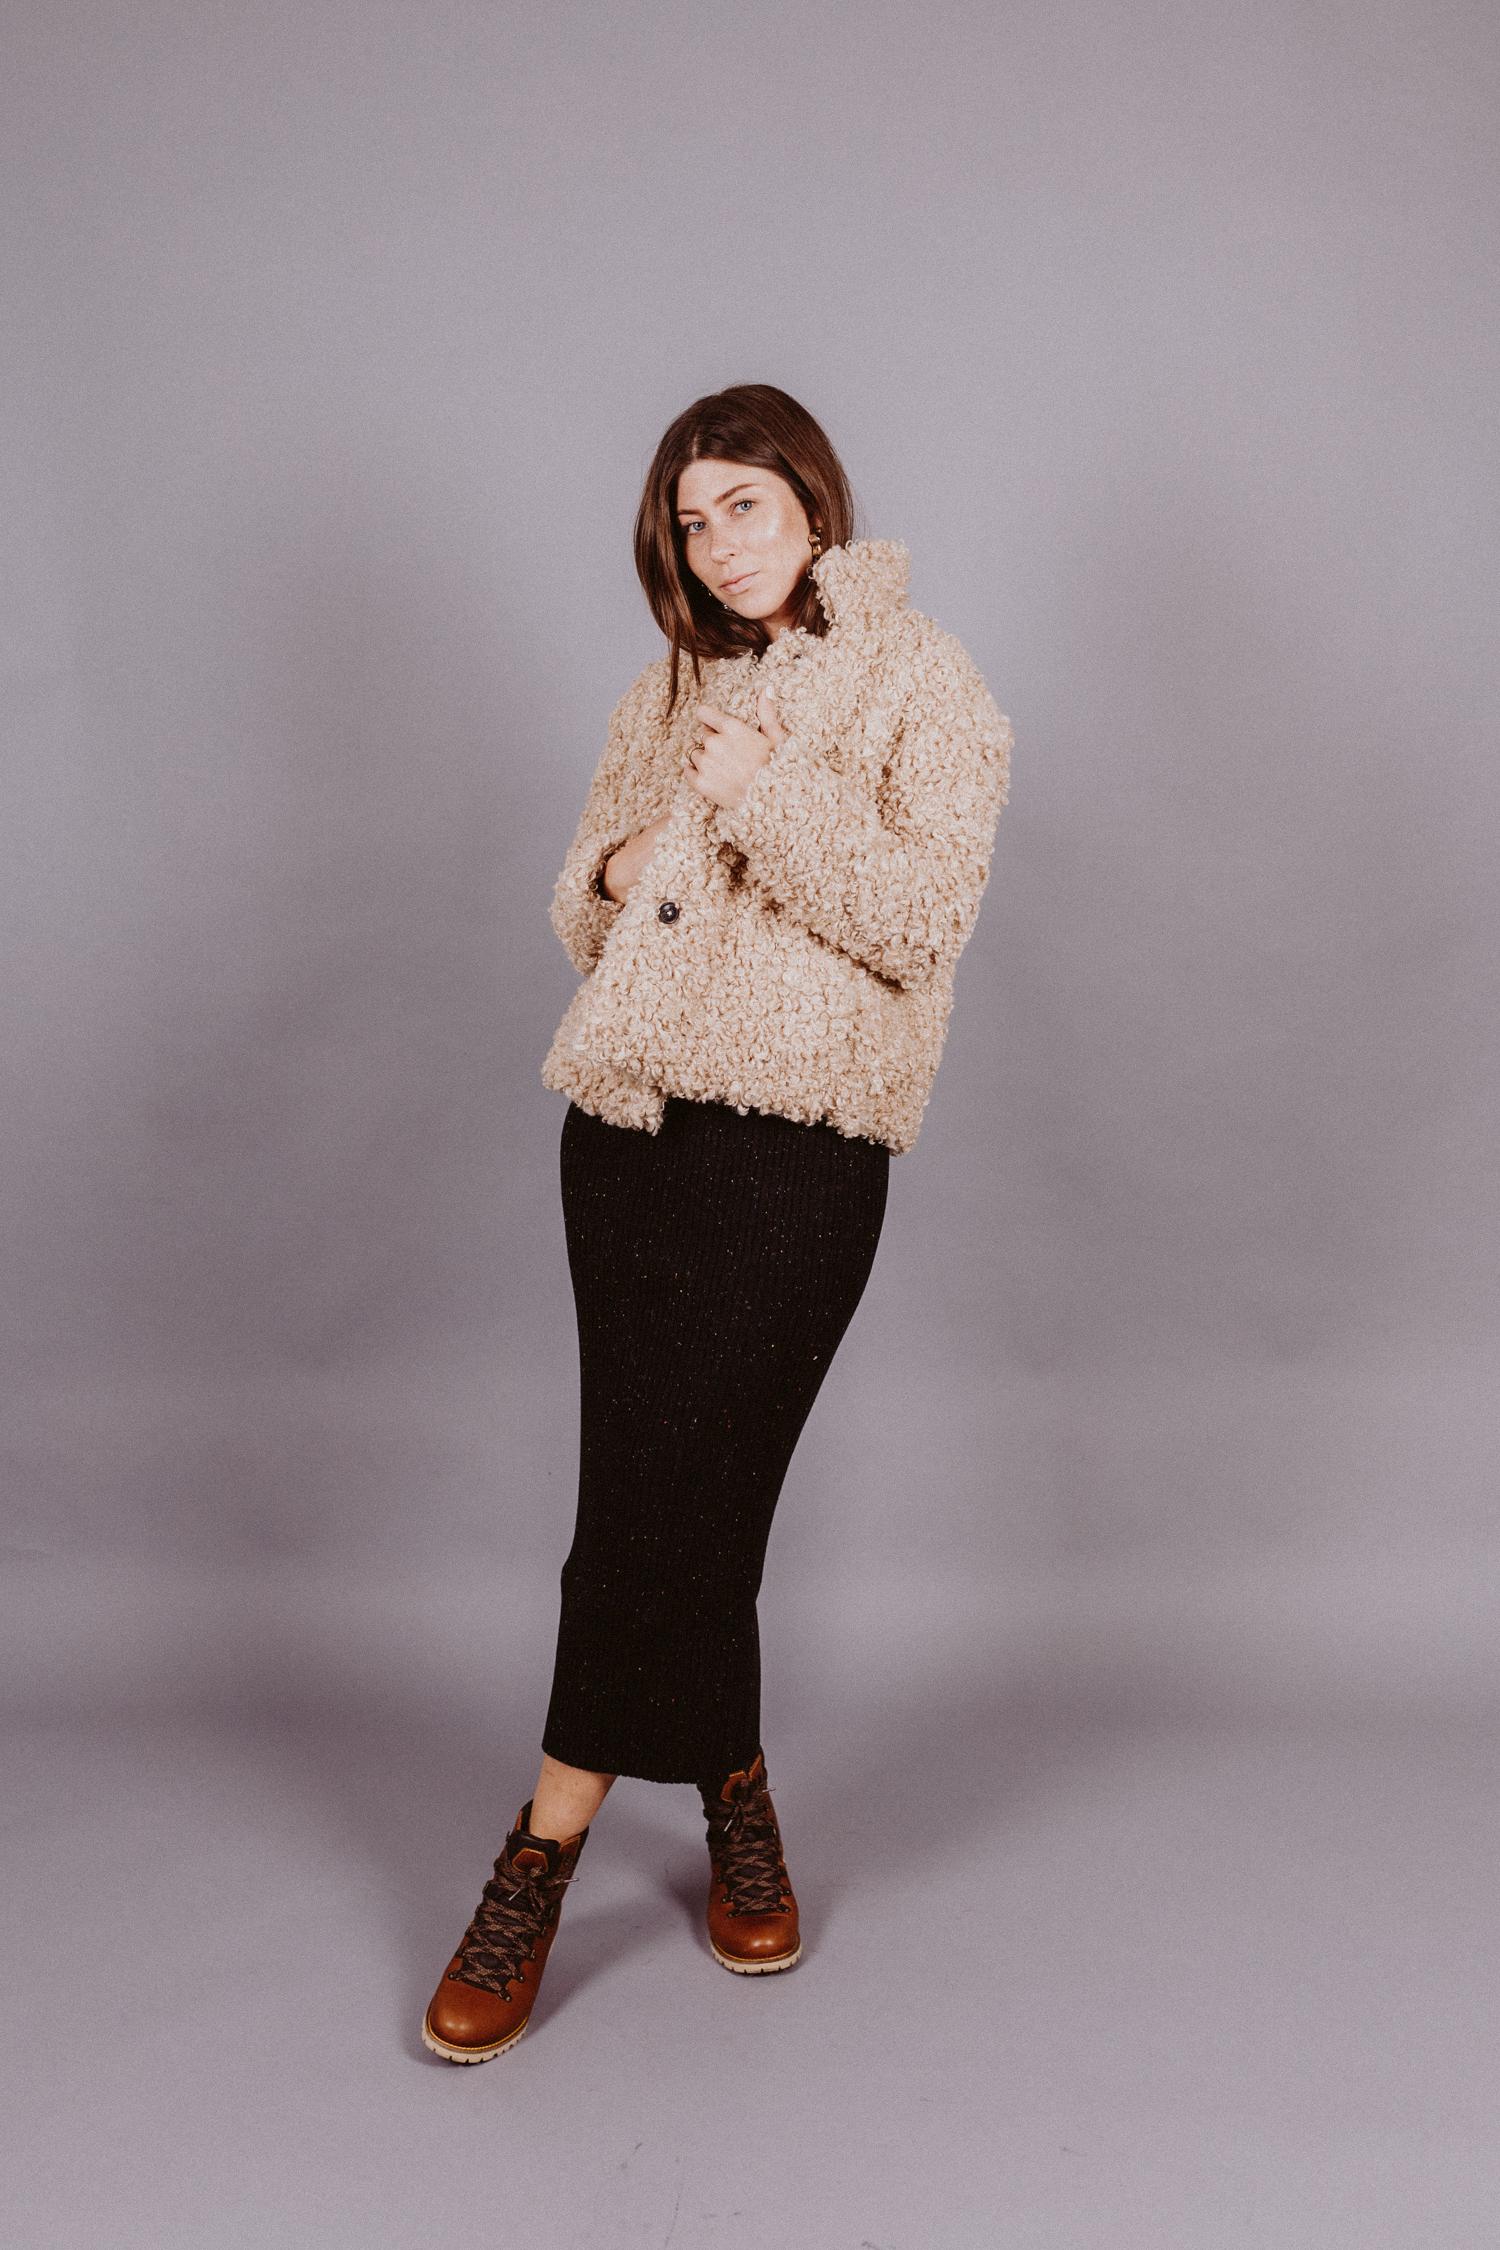 3 ways to wear: midiskirts, midirock styling | Love Daily Dose